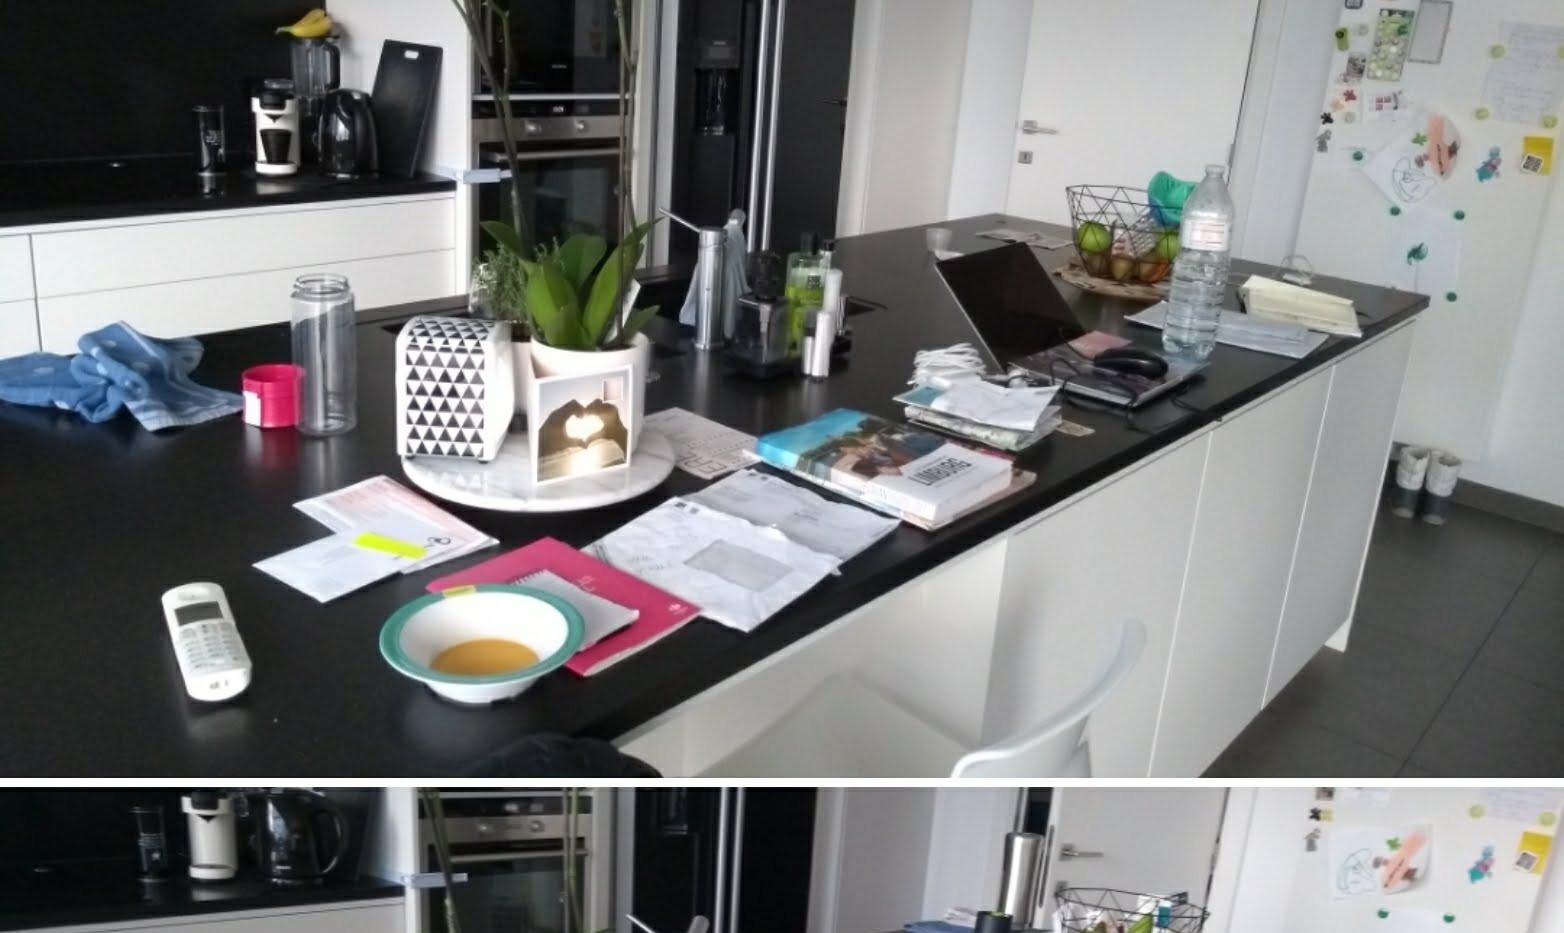 keuken opruimen - clean deks